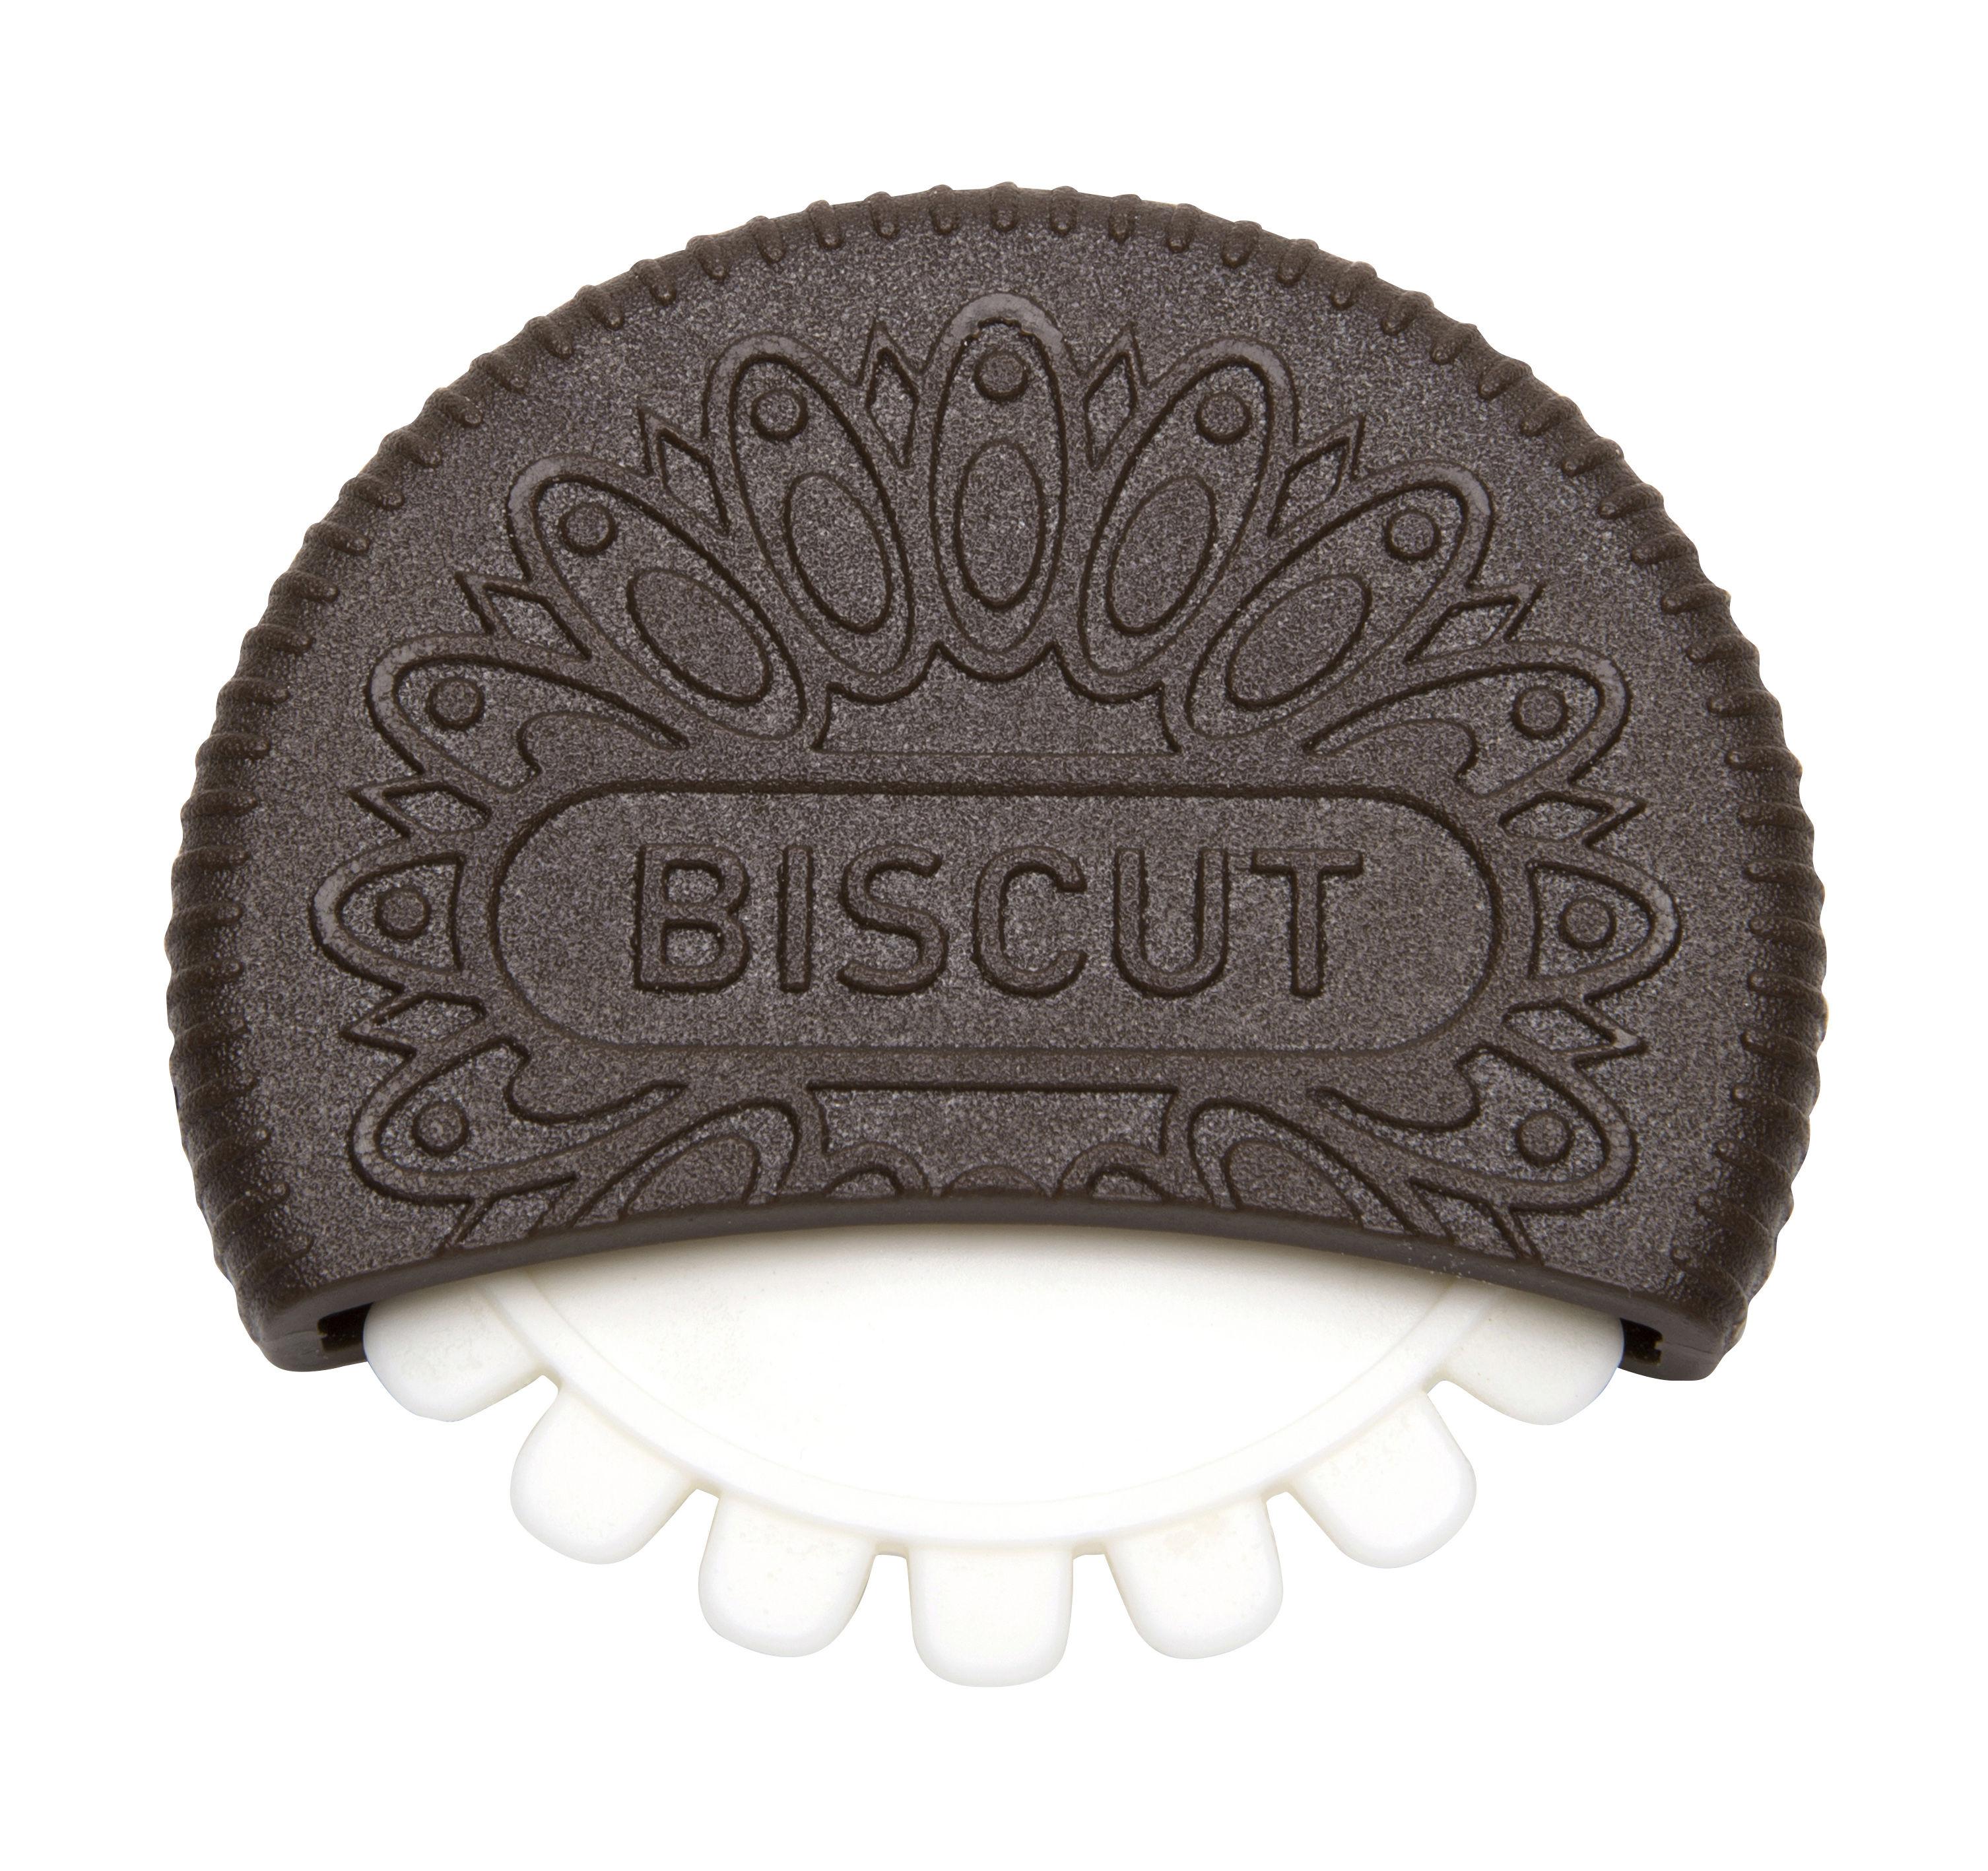 Accessories - Home Accessories - Biscut Utensil - Cookie cutter by Pa Design - Dark brown / White - Hard plastic